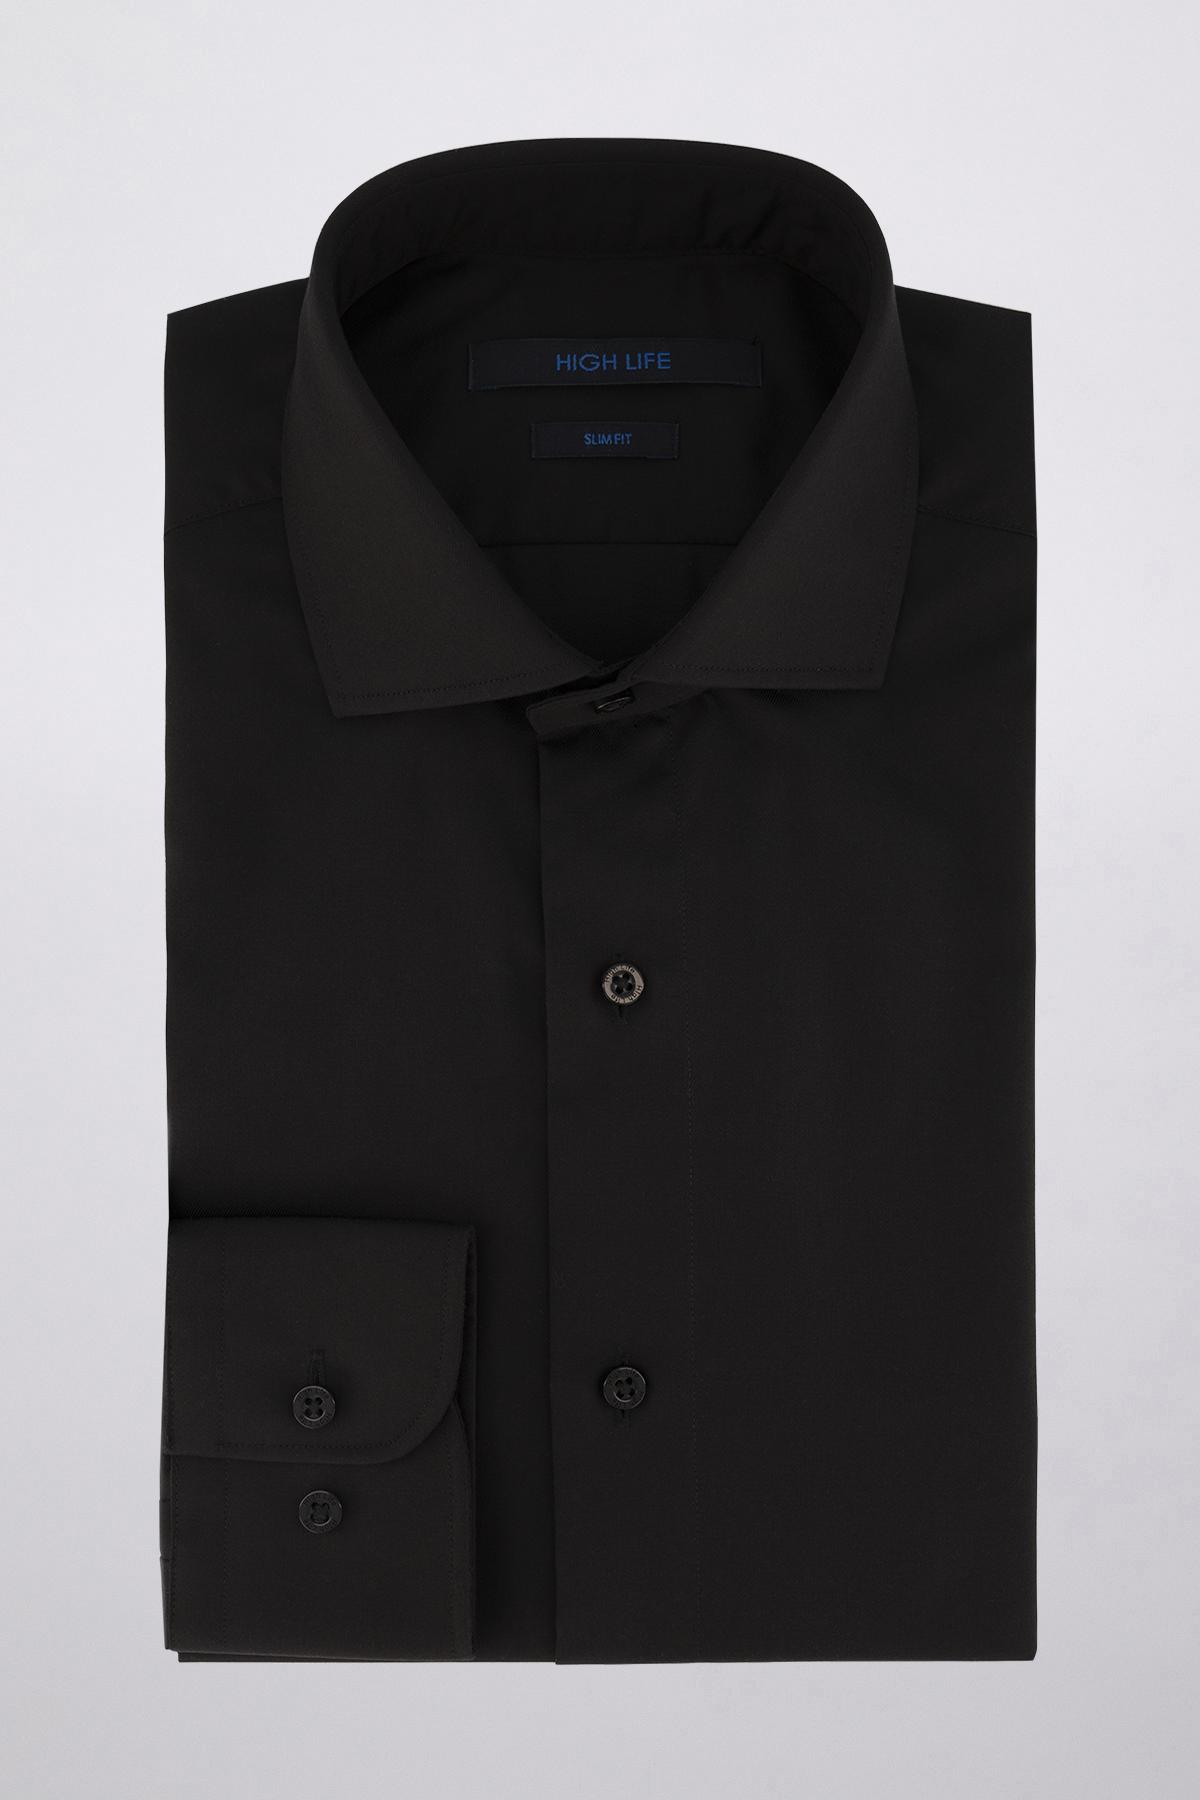 Camisa Vestir marca HIGH LIFE color Negro